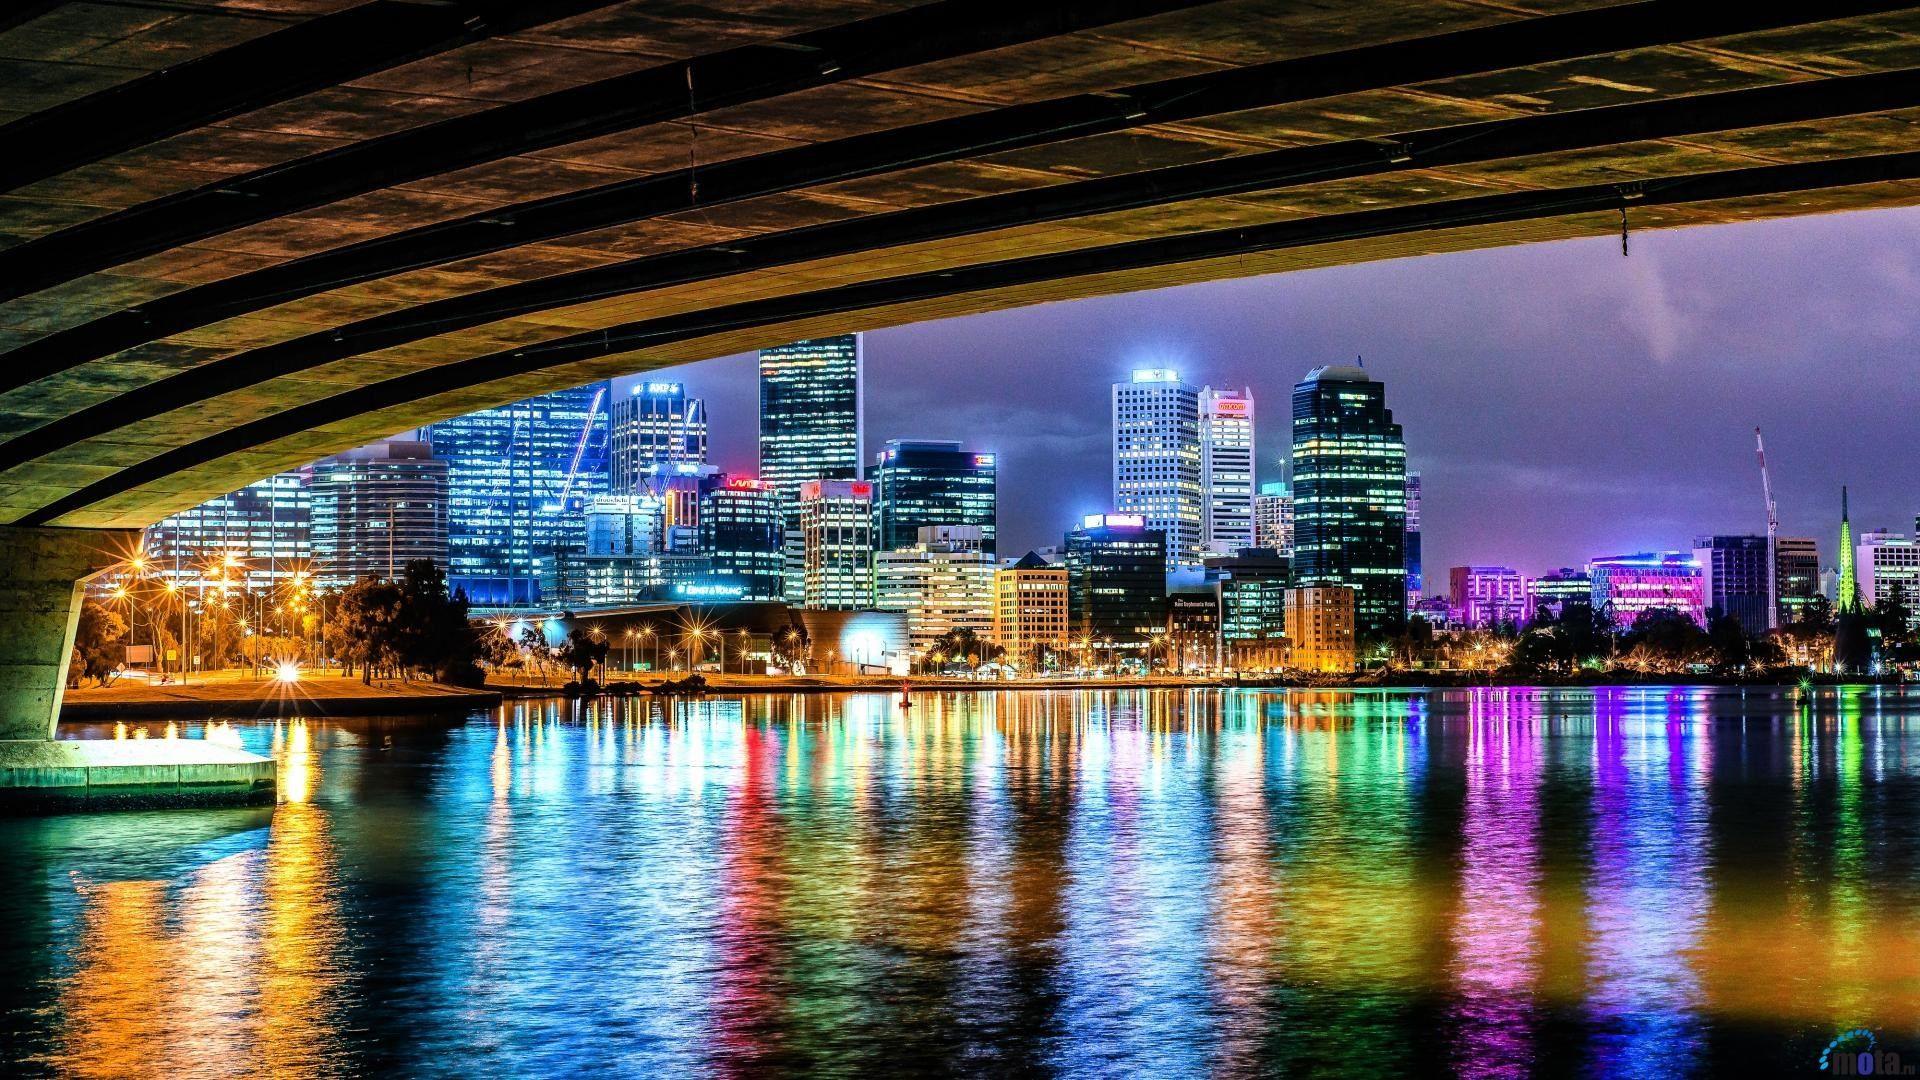 Wallpaper Suppliers Sydney Australia Wallppapers Gallery